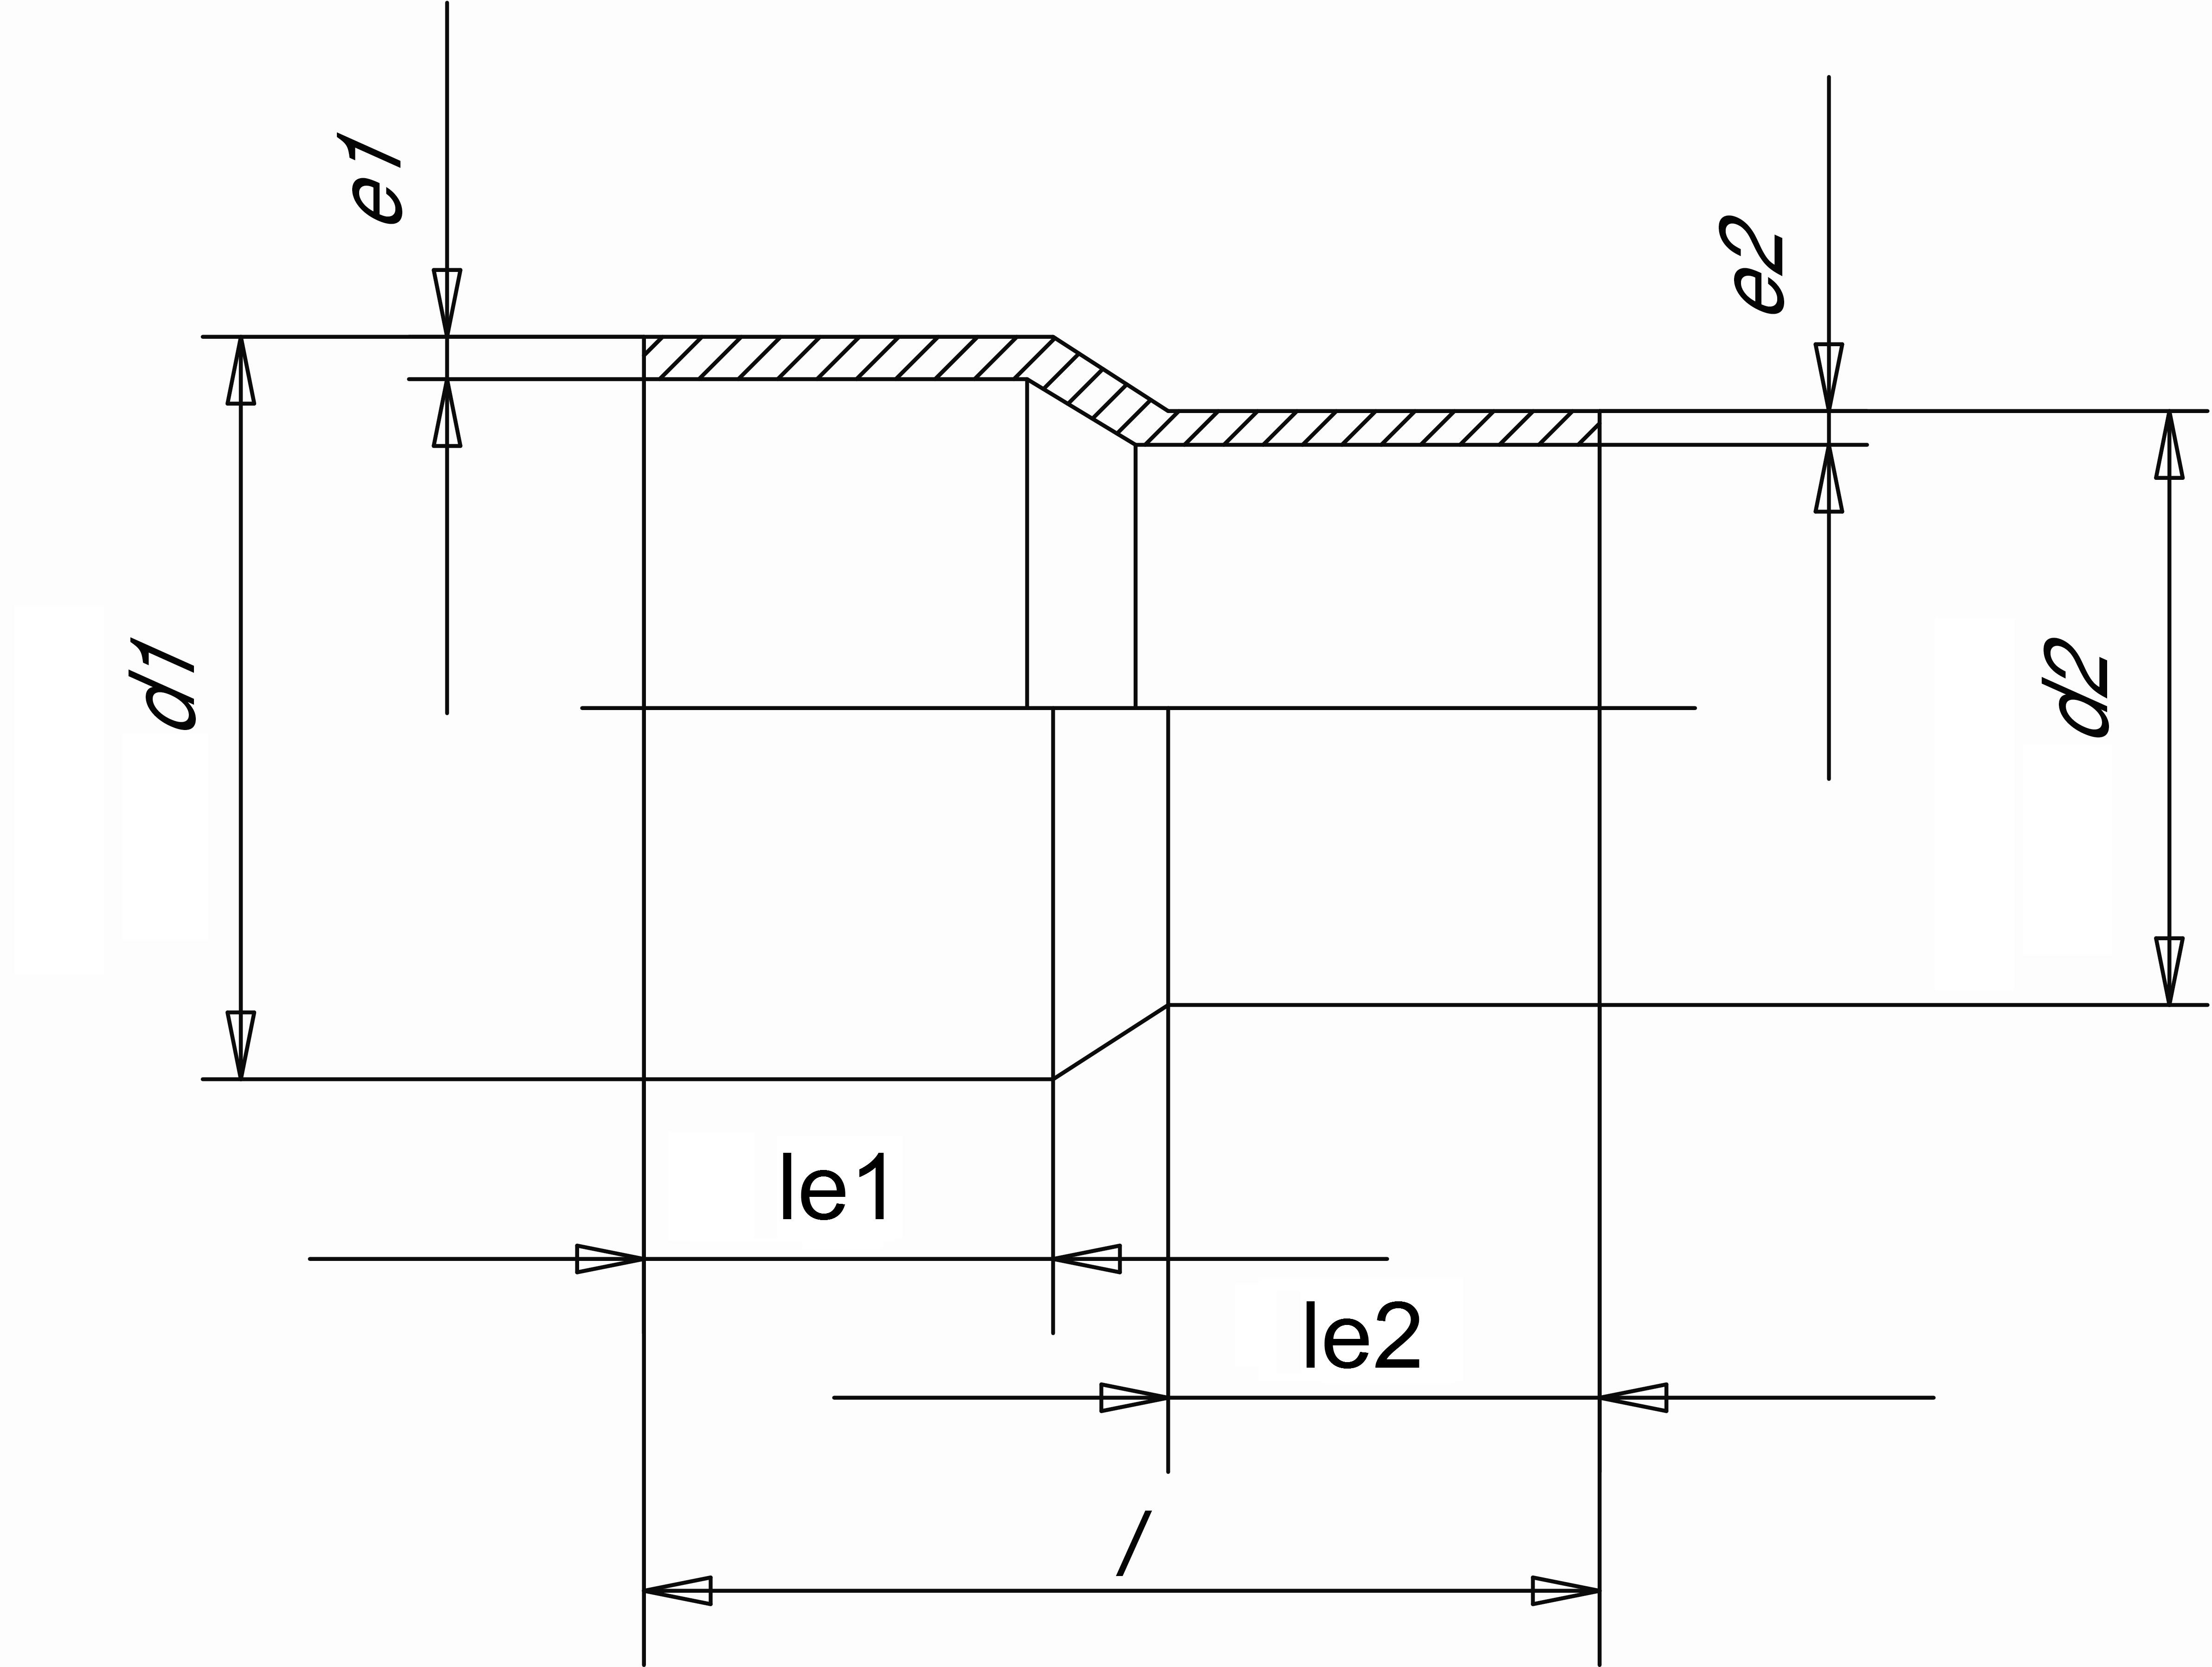 Муфта редукционная (Simona) SDR21 PN16 110x63